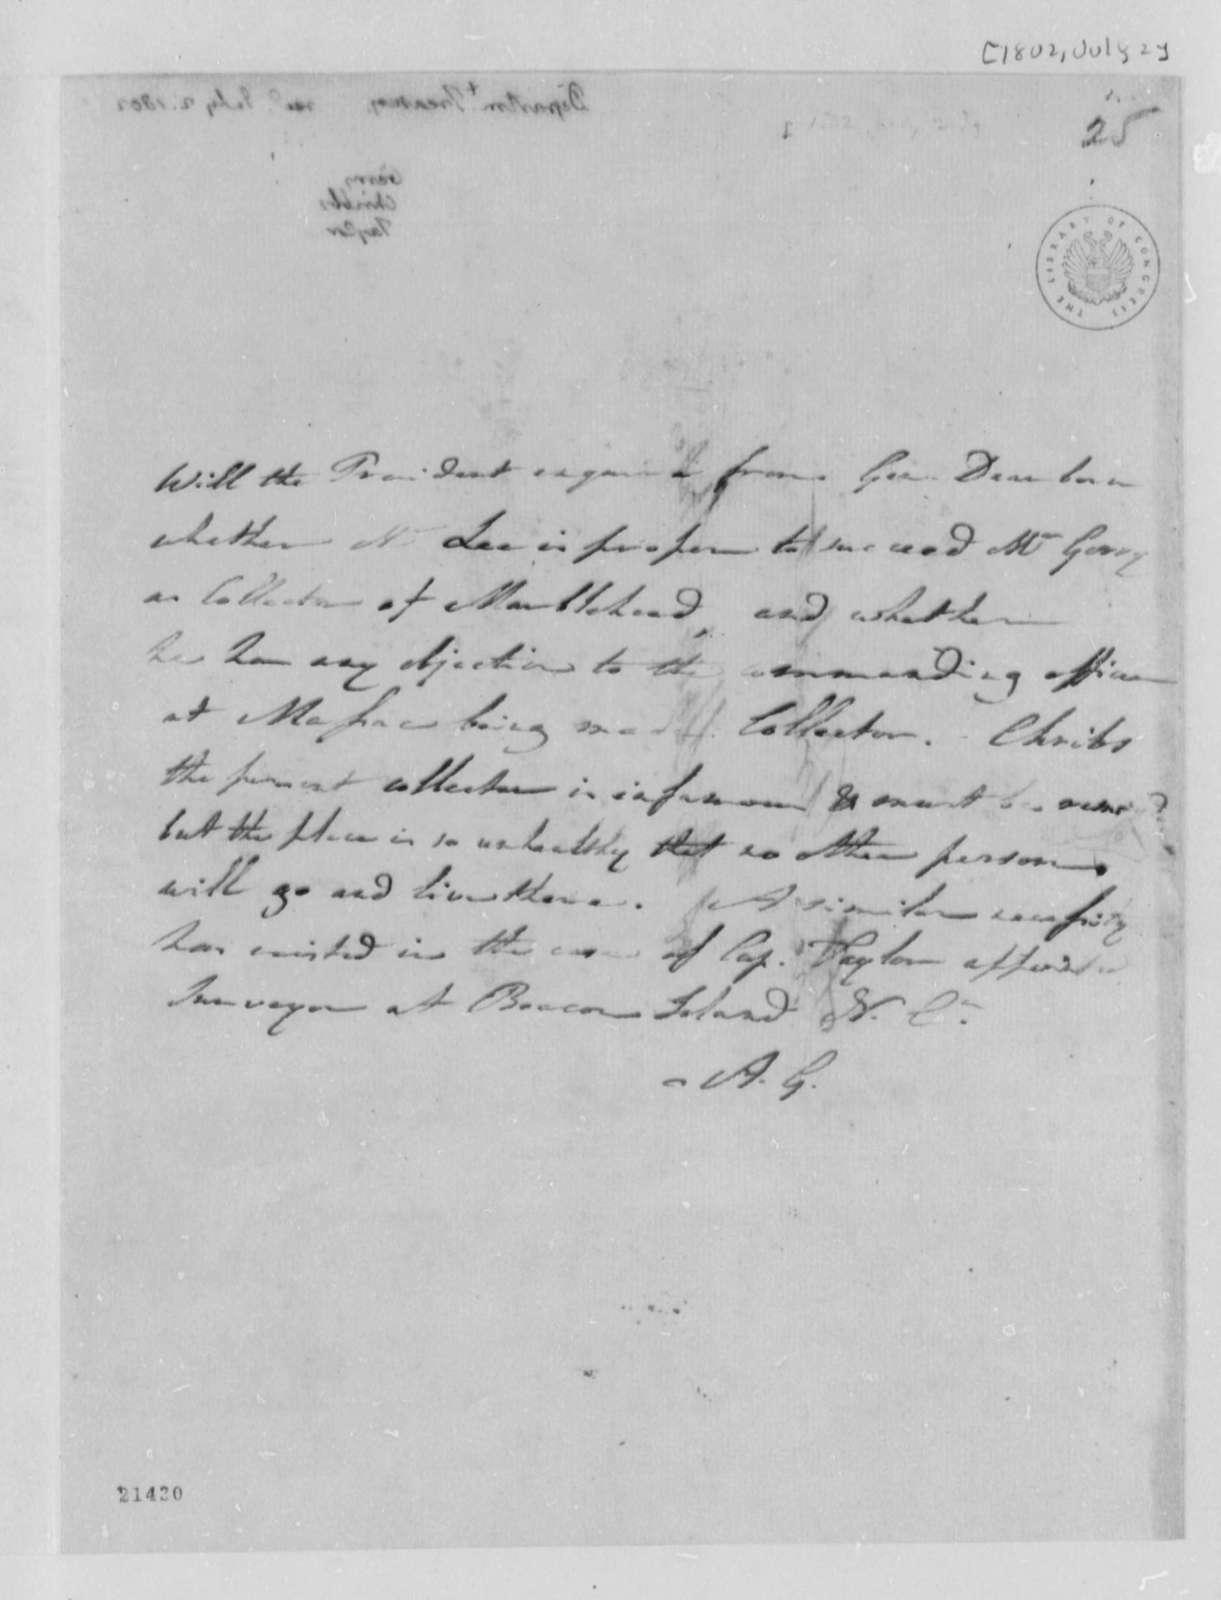 Albert Gallatin to Thomas Jefferson, July 2, 1802